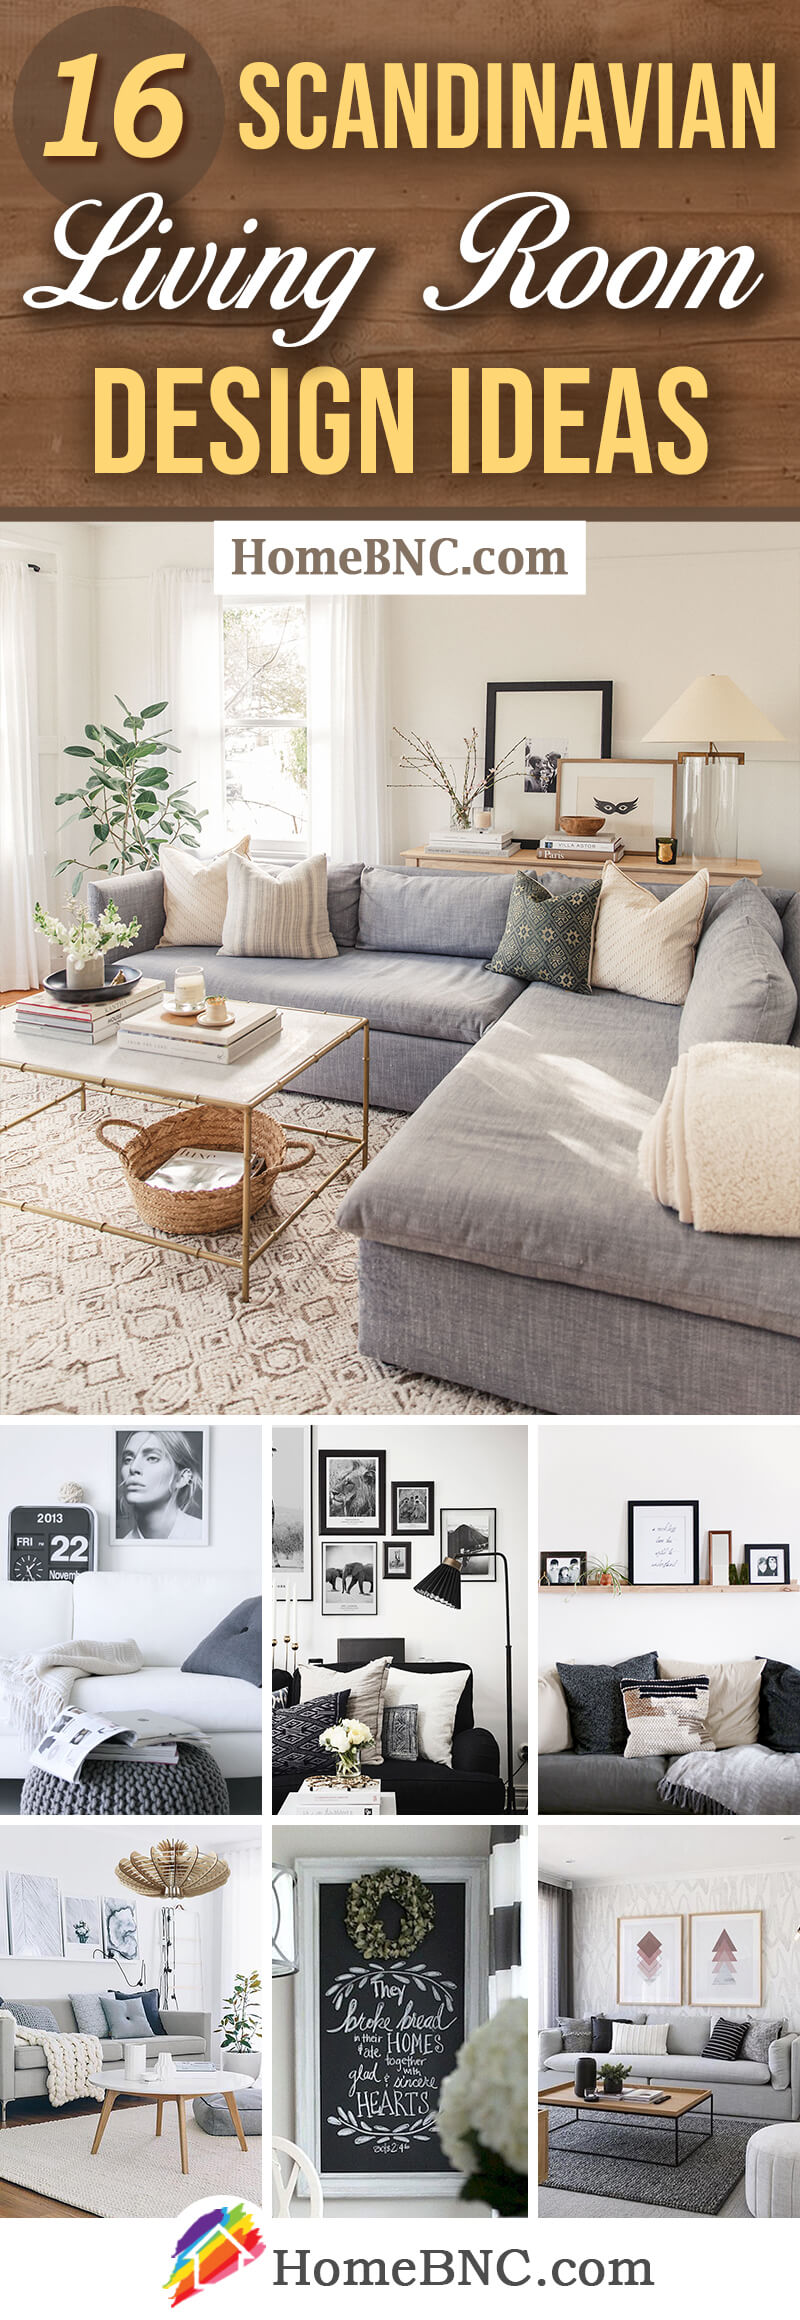 Best Scandinavian Living Room Ideas and Designs